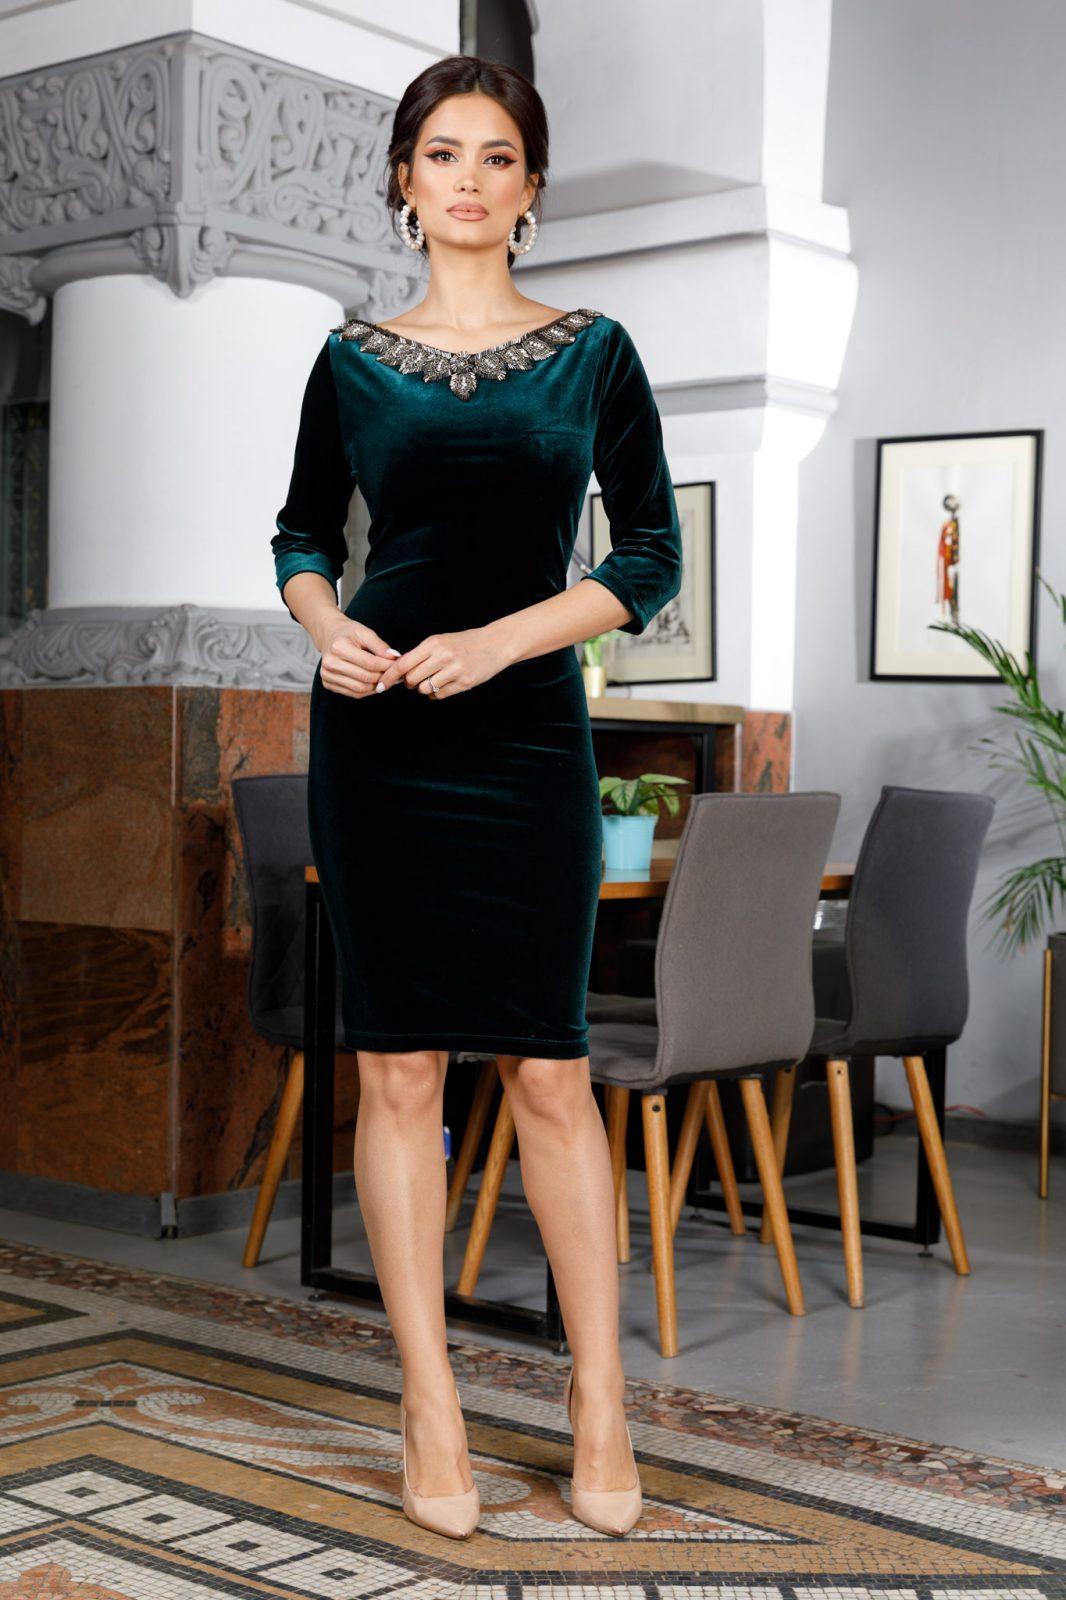 Enigma Πράσινο Φόρεμα 5957